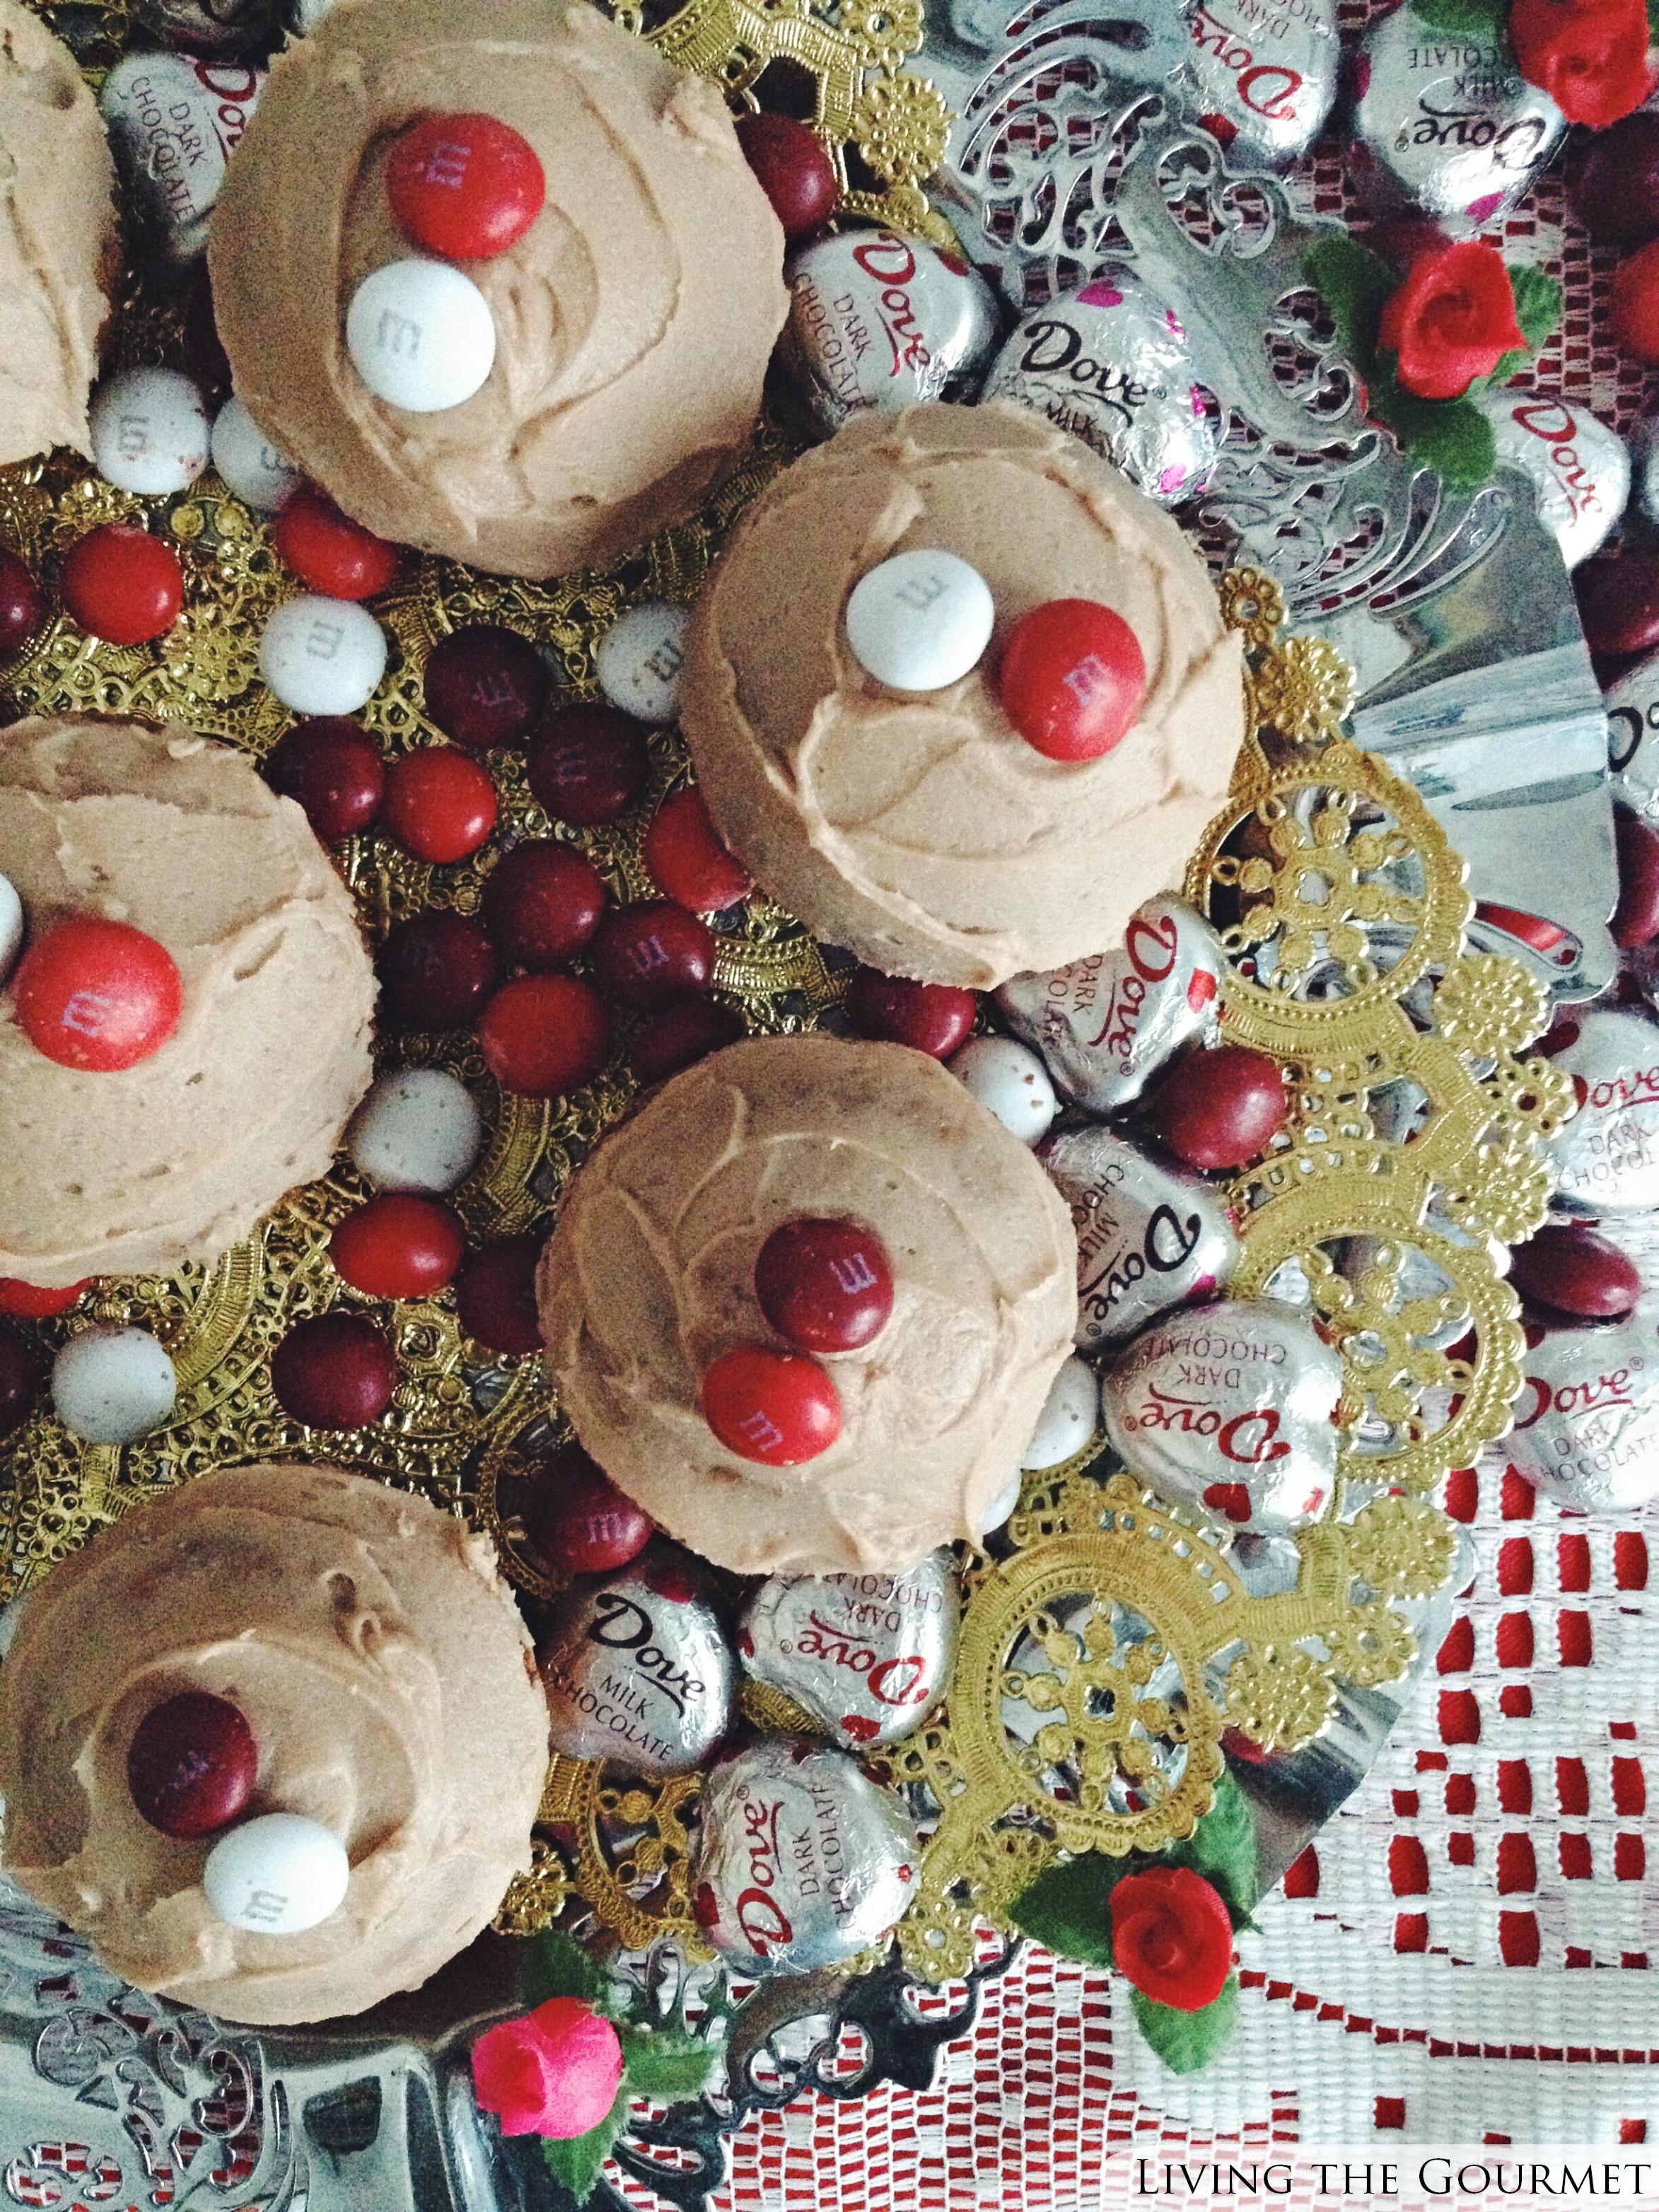 Living the Gourmet: M&M's® Red Velvet Candy Cupcakes #RedVelvetLove #Ad